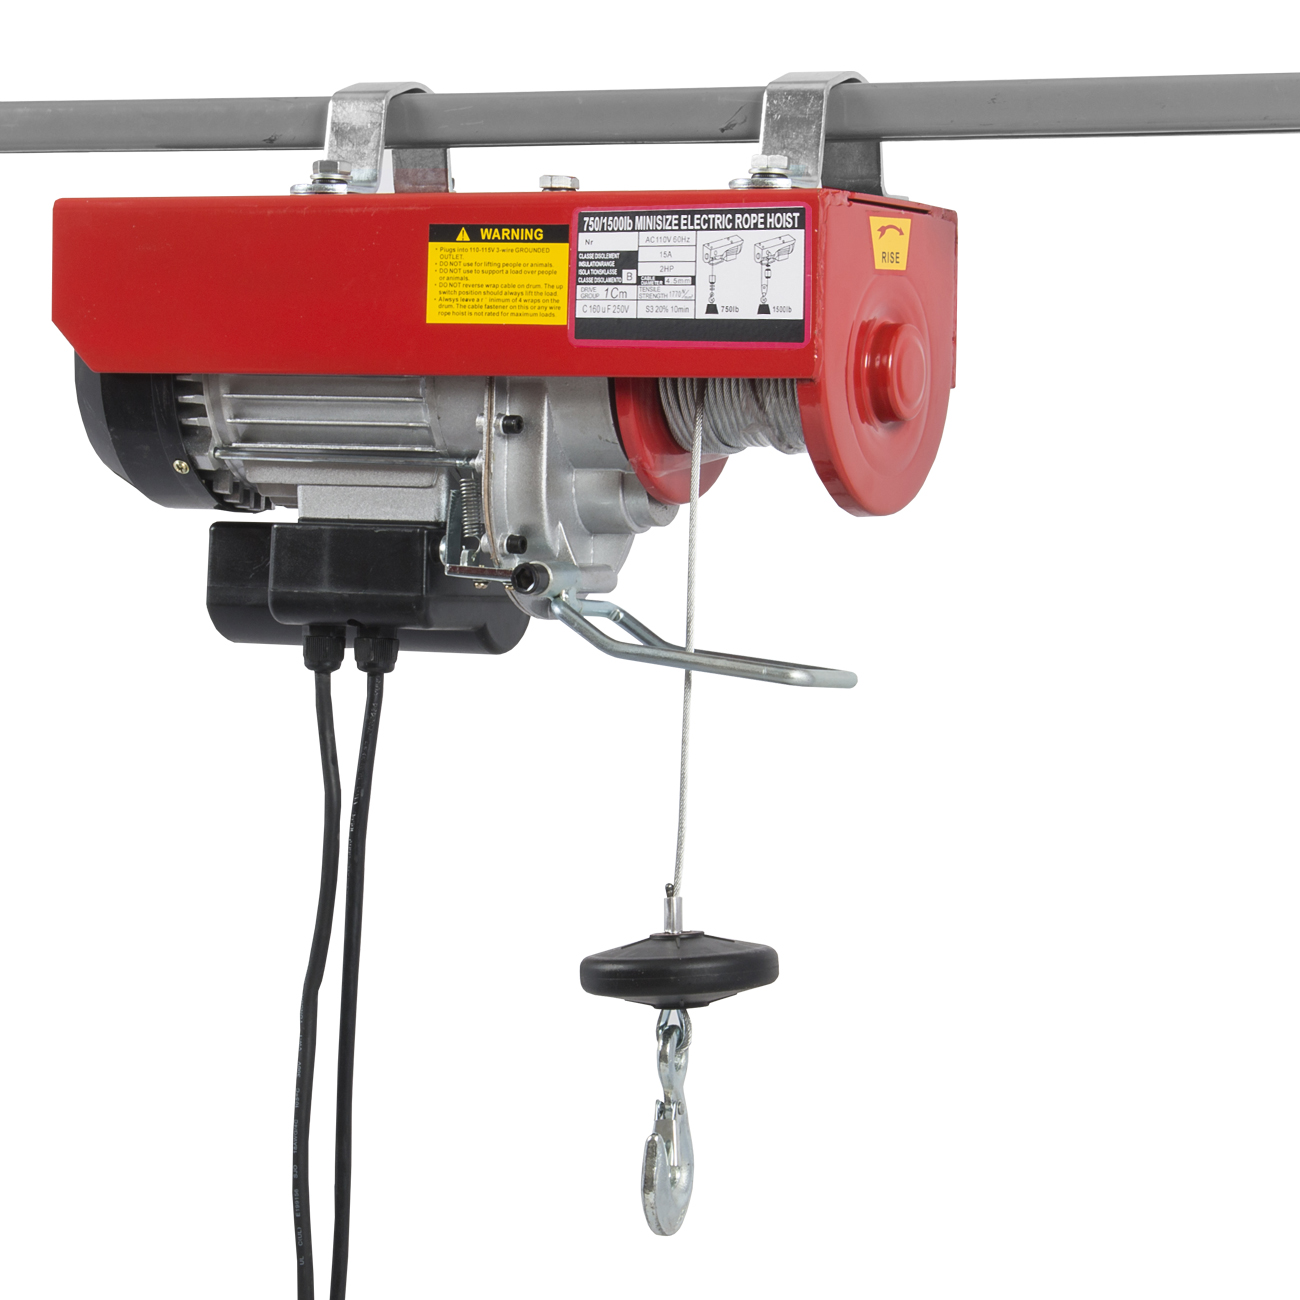 New 1500lb electric motor overhead winch hoist crane lift for Motors used in cranes